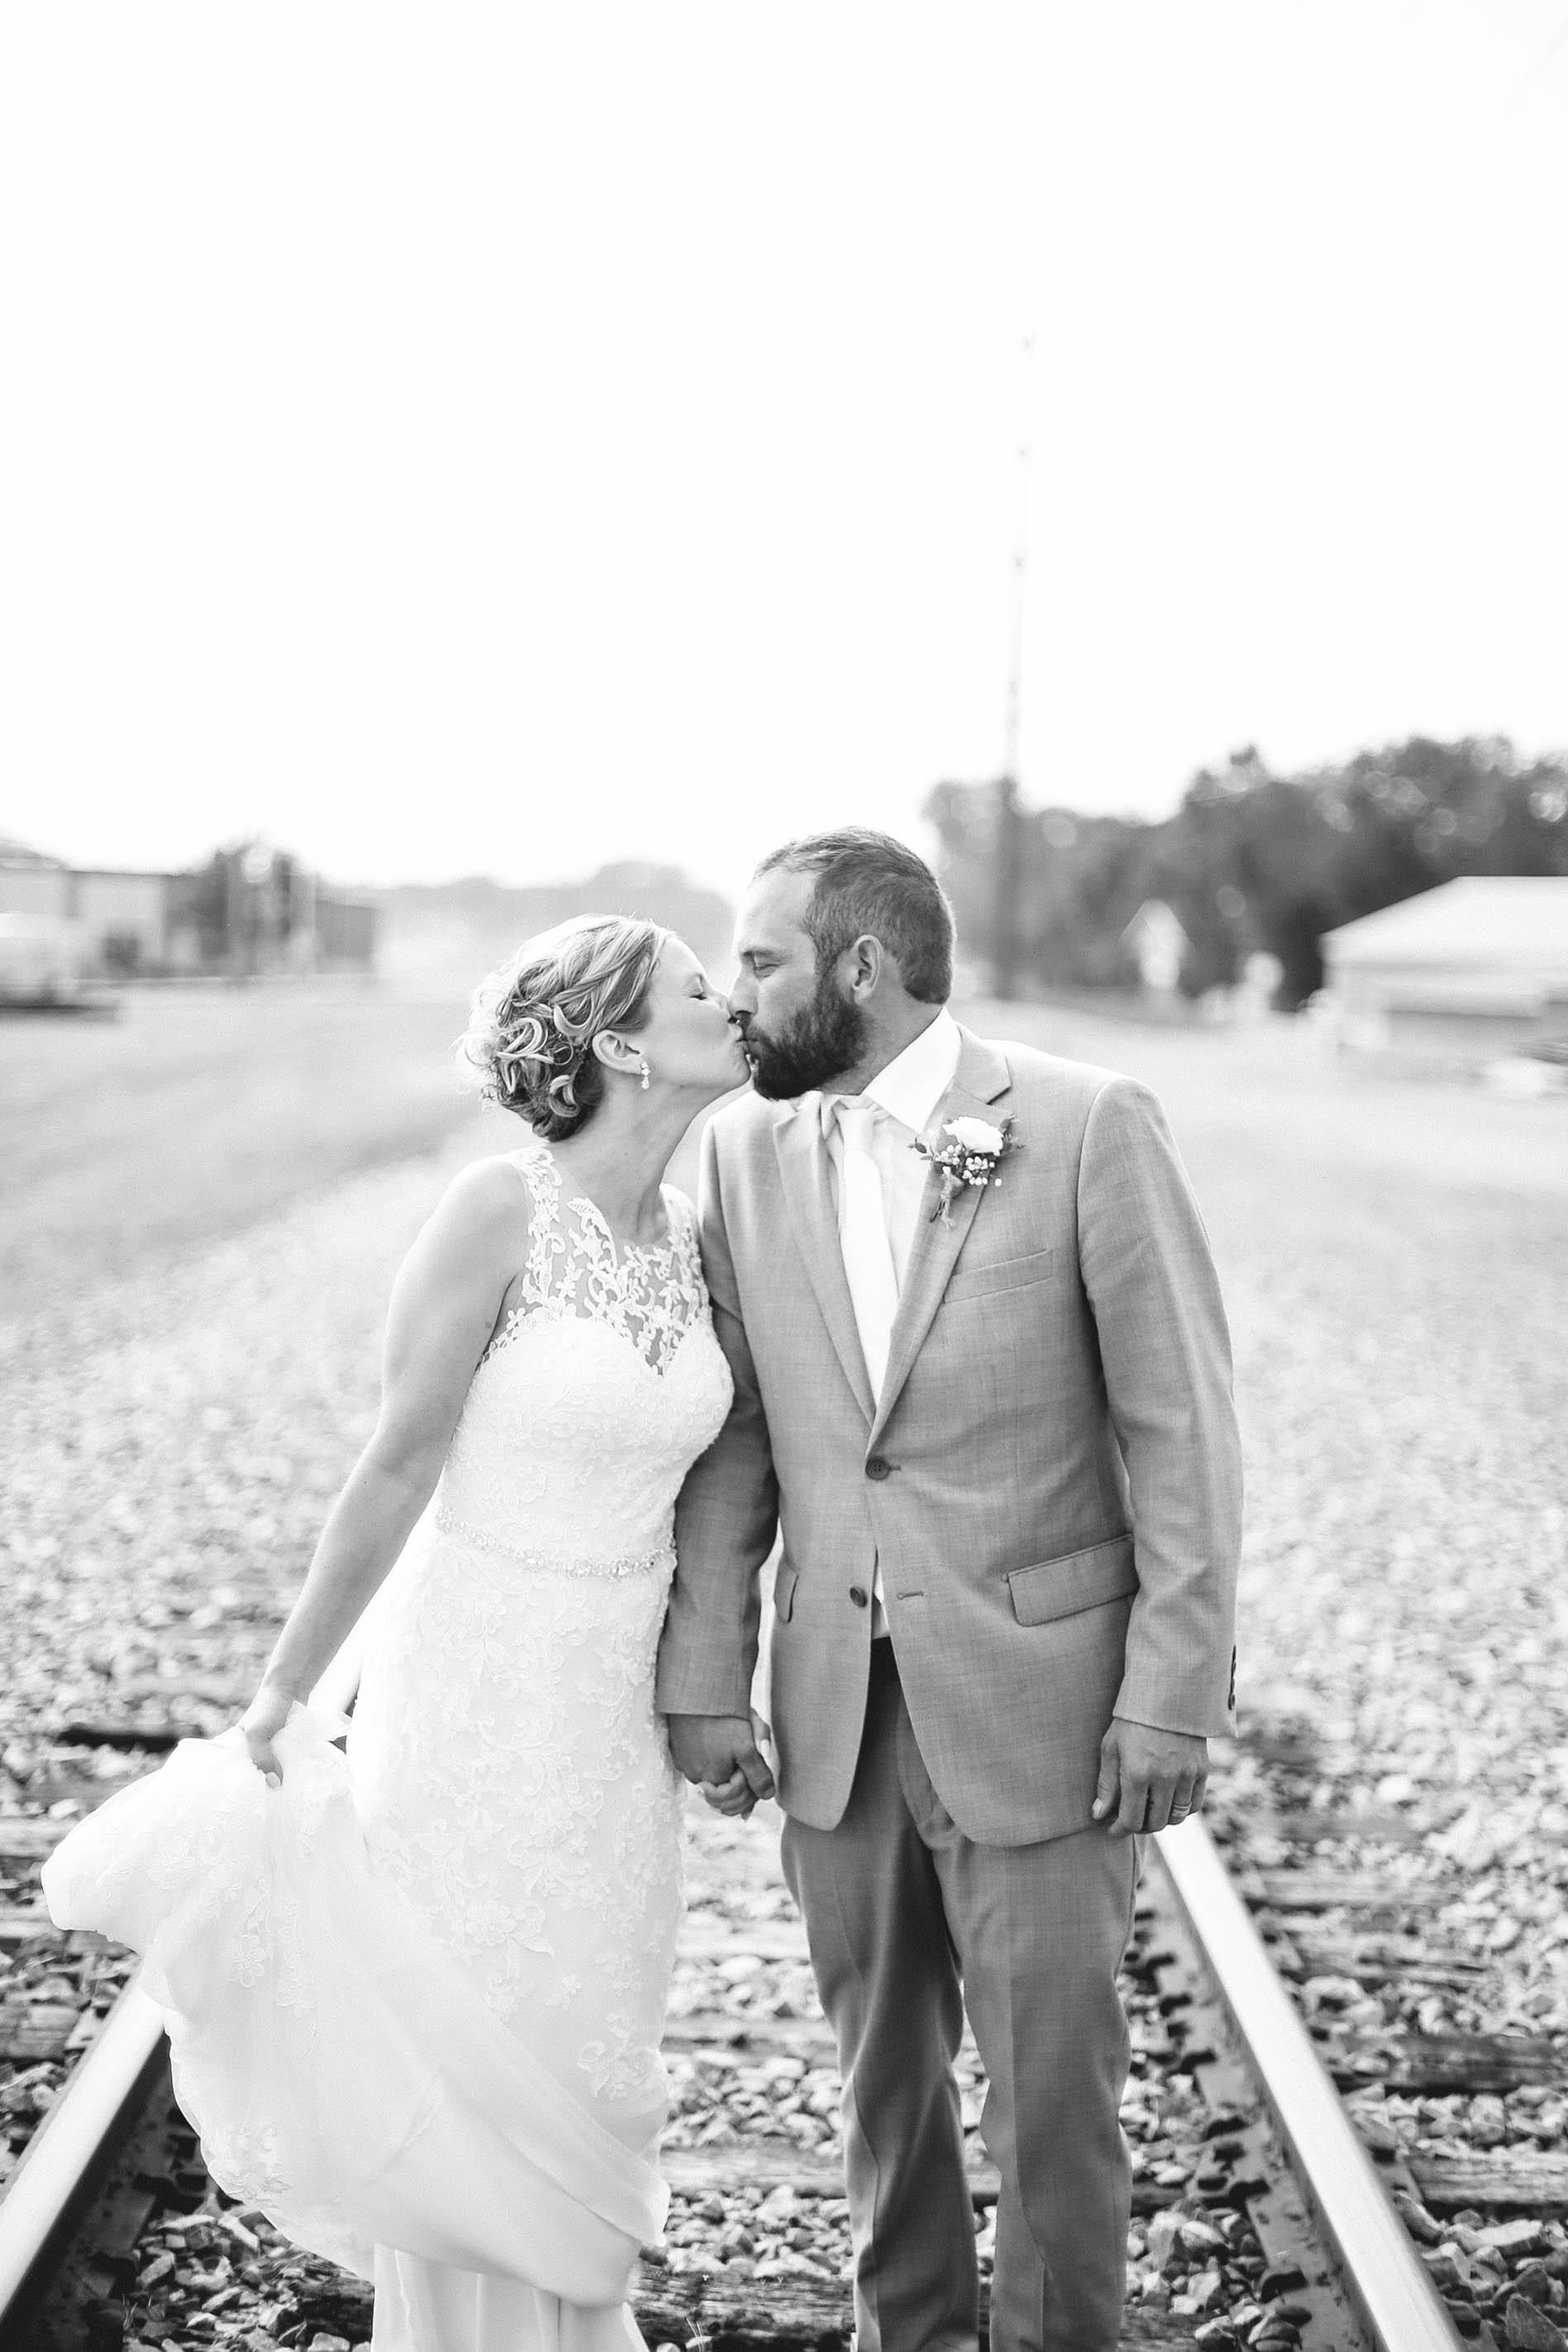 Chad and Dana's Wedding (560 of 581).jpg